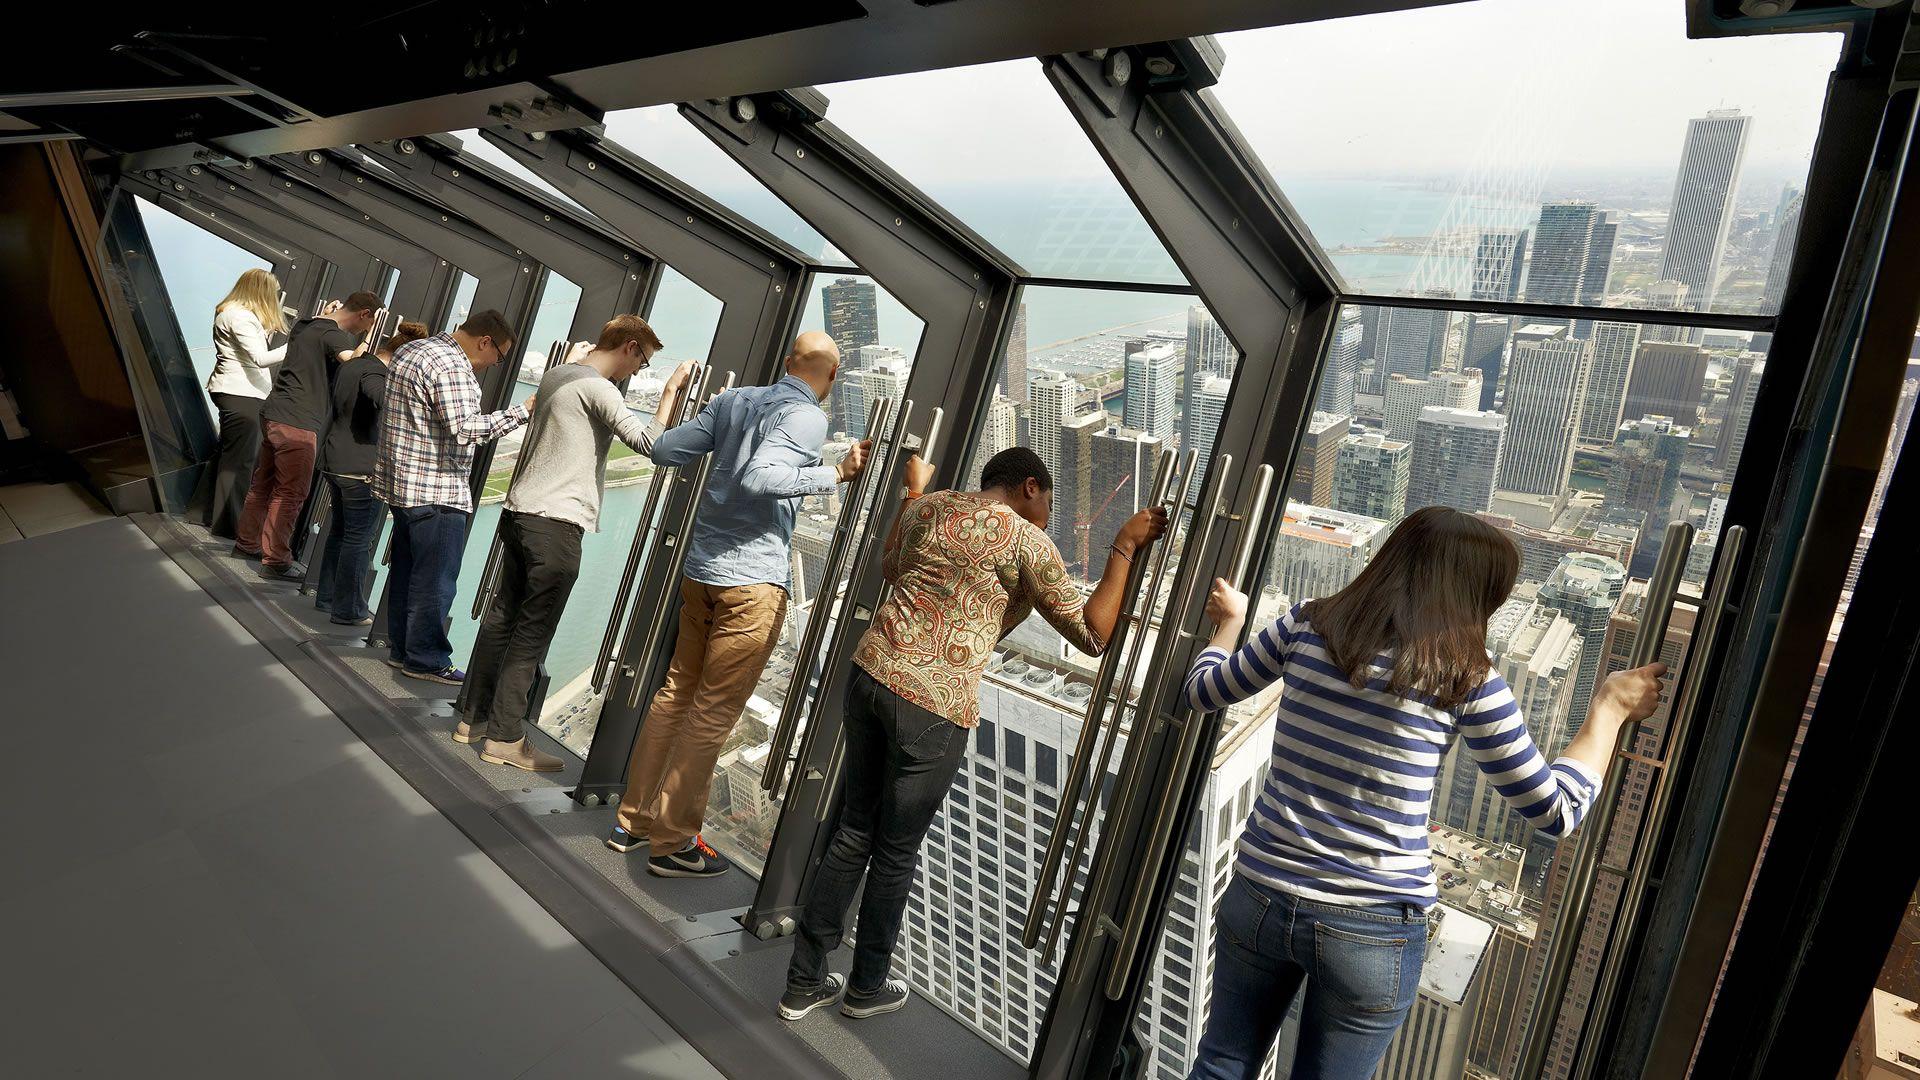 Tilt: la atracción para ver Chicago desde un rascacielos (e inclinado)